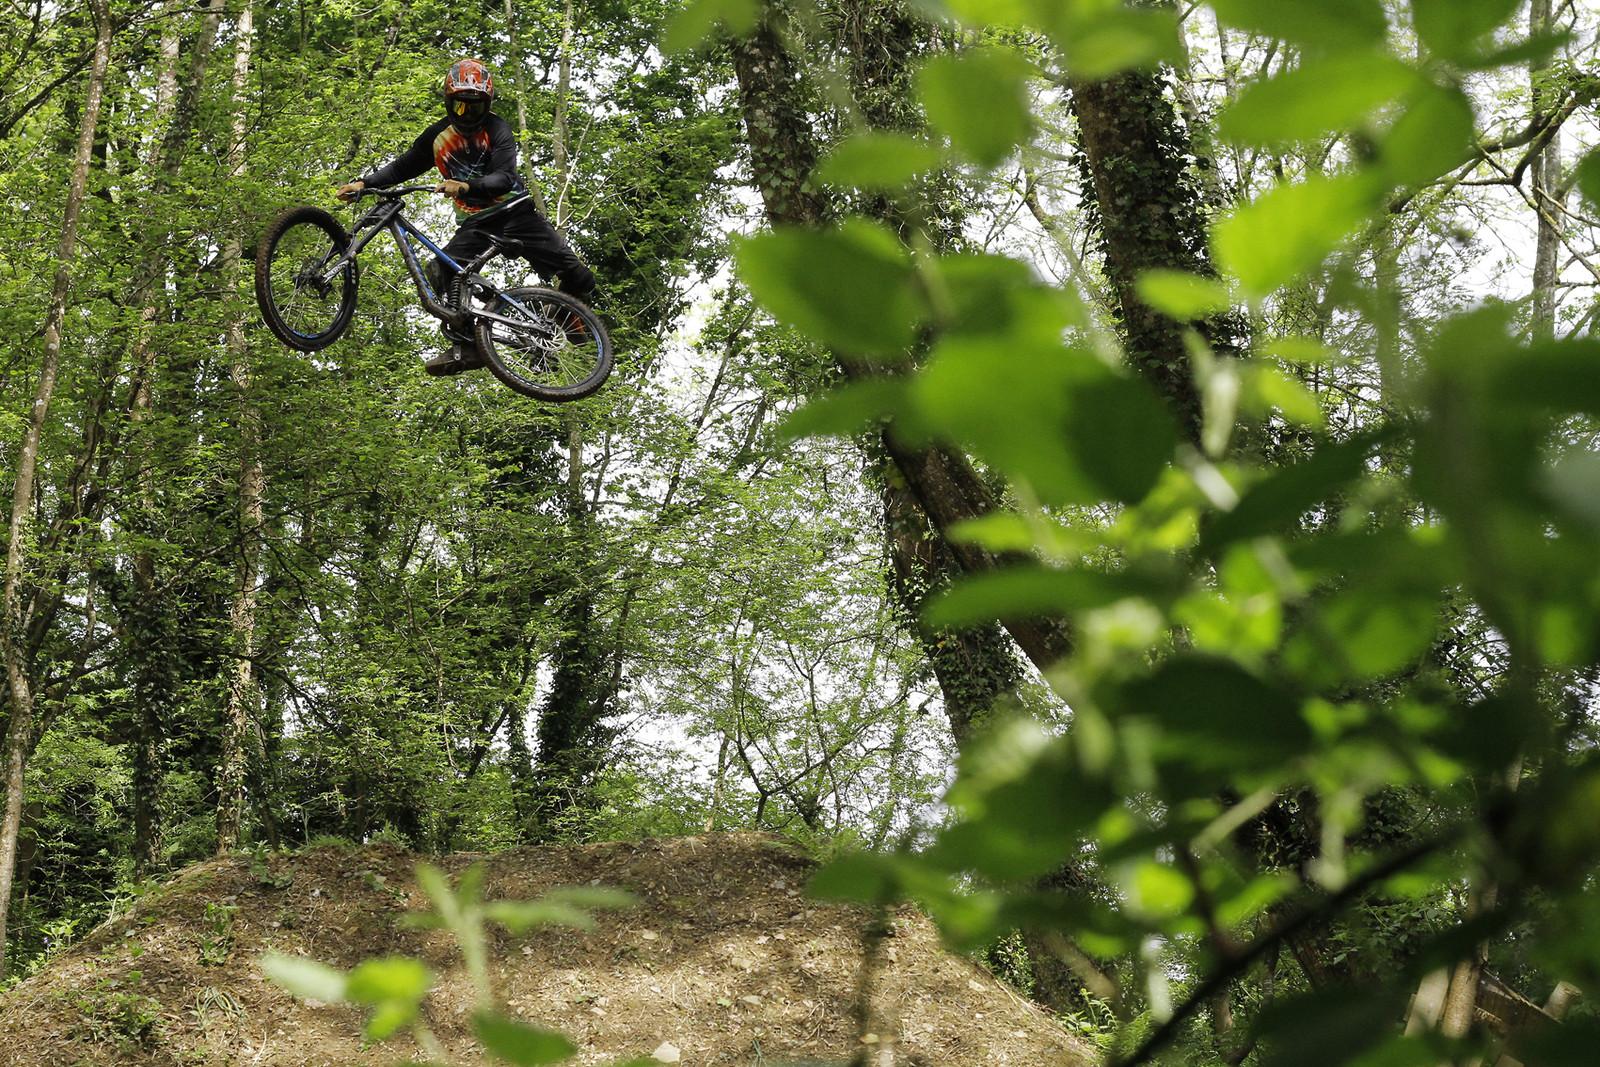 Nac Nac - CaldwellVisuals - Mountain Biking Pictures - Vital MTB